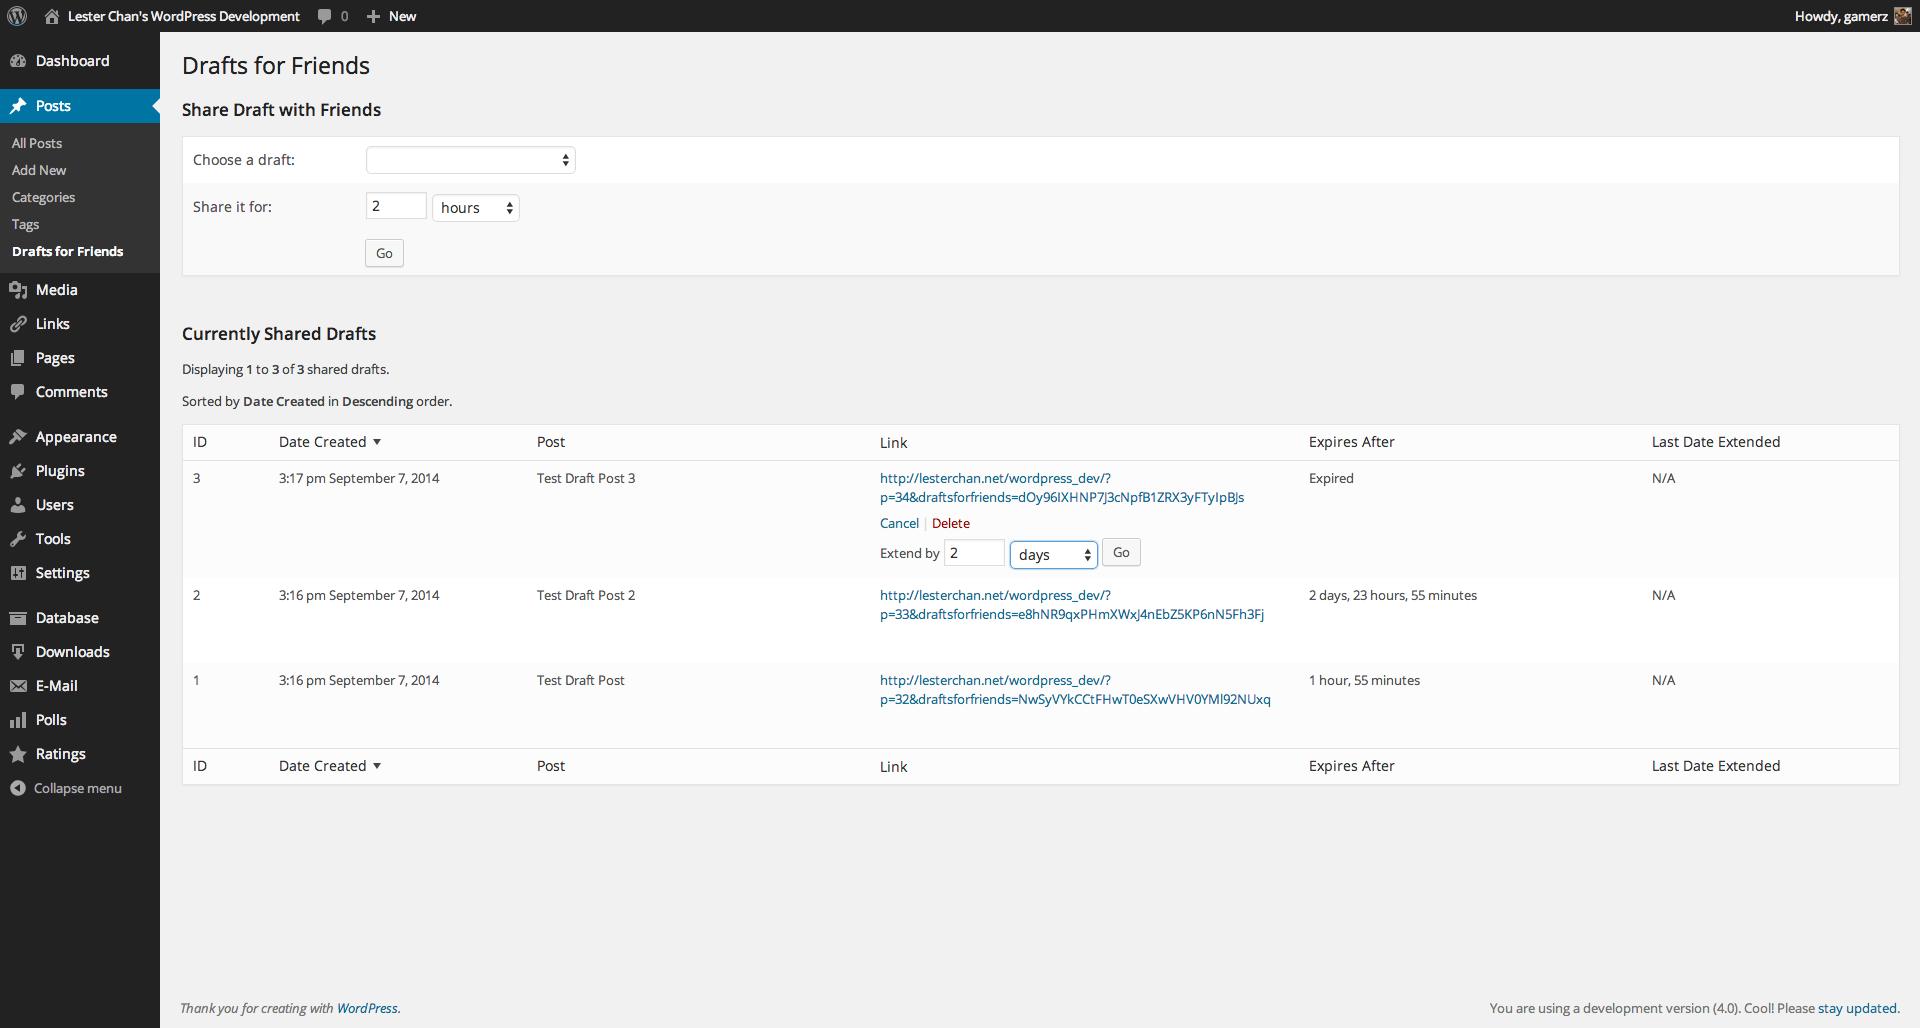 WP-DraftsForFriends's Screenshot: Extending Expiry of Shared Draft